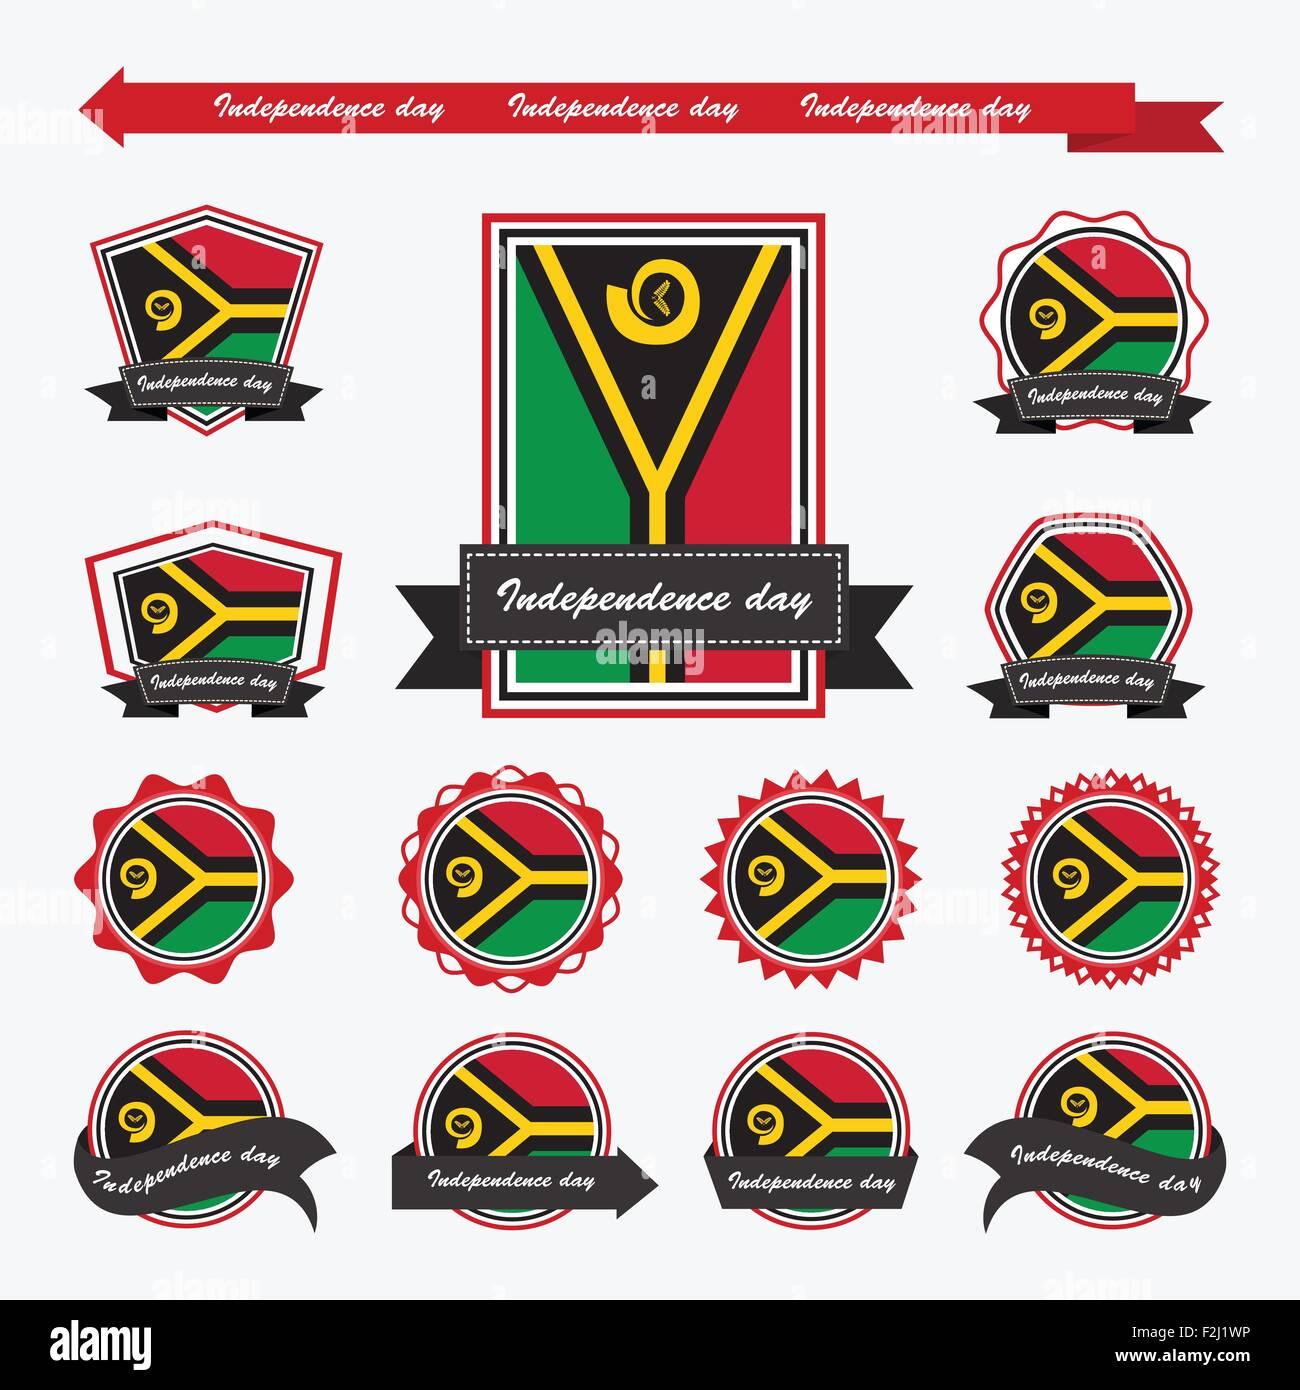 Vanuatu independence day flags infographic design - Stock Vector